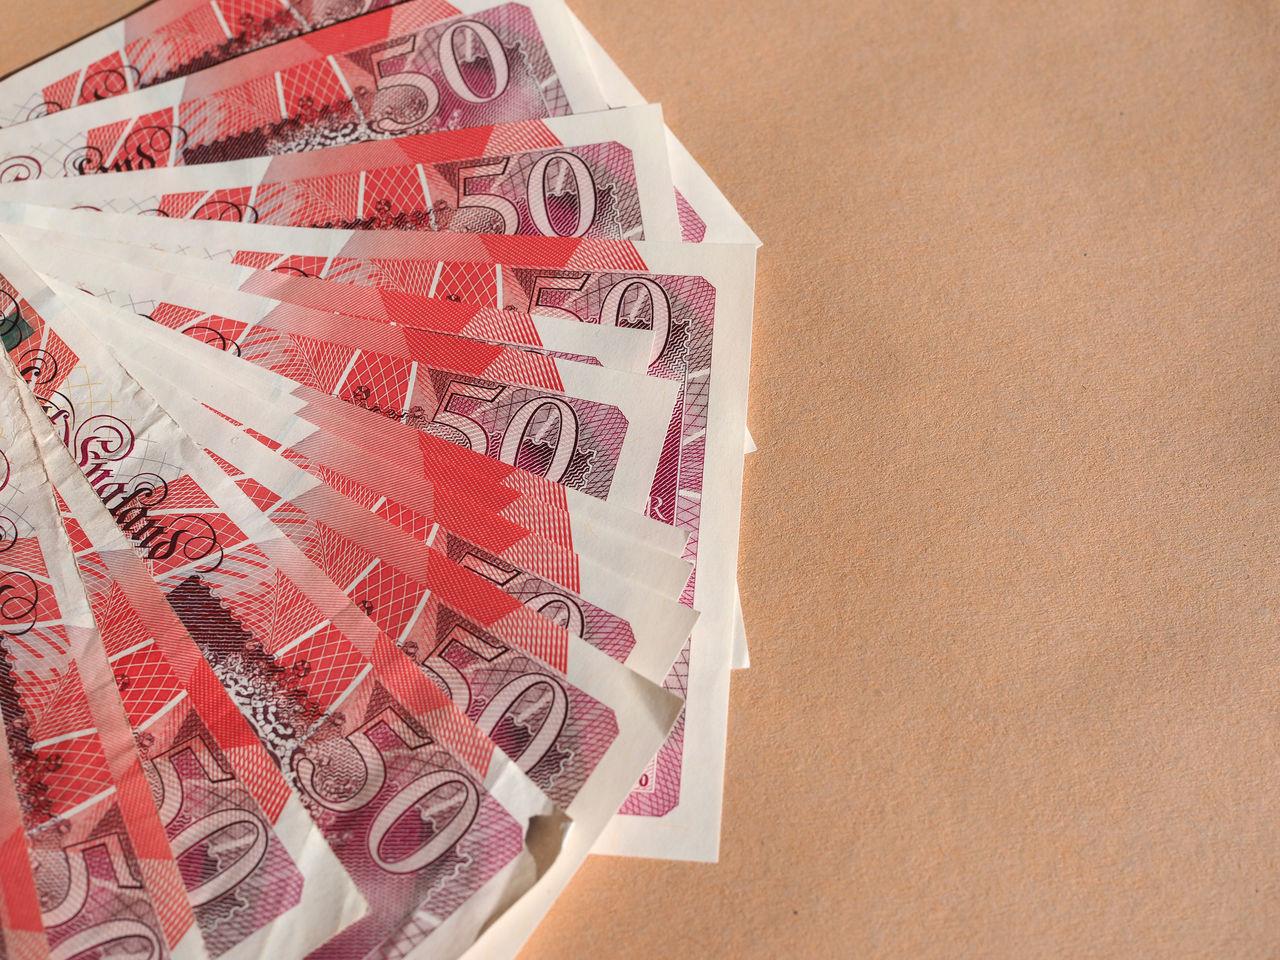 British Pounds banknotes money currency Backgrounds Banknote Banknotes Brexit British Currency Gbp Money Note Pound Pounds Sterling Uk United Kingdom